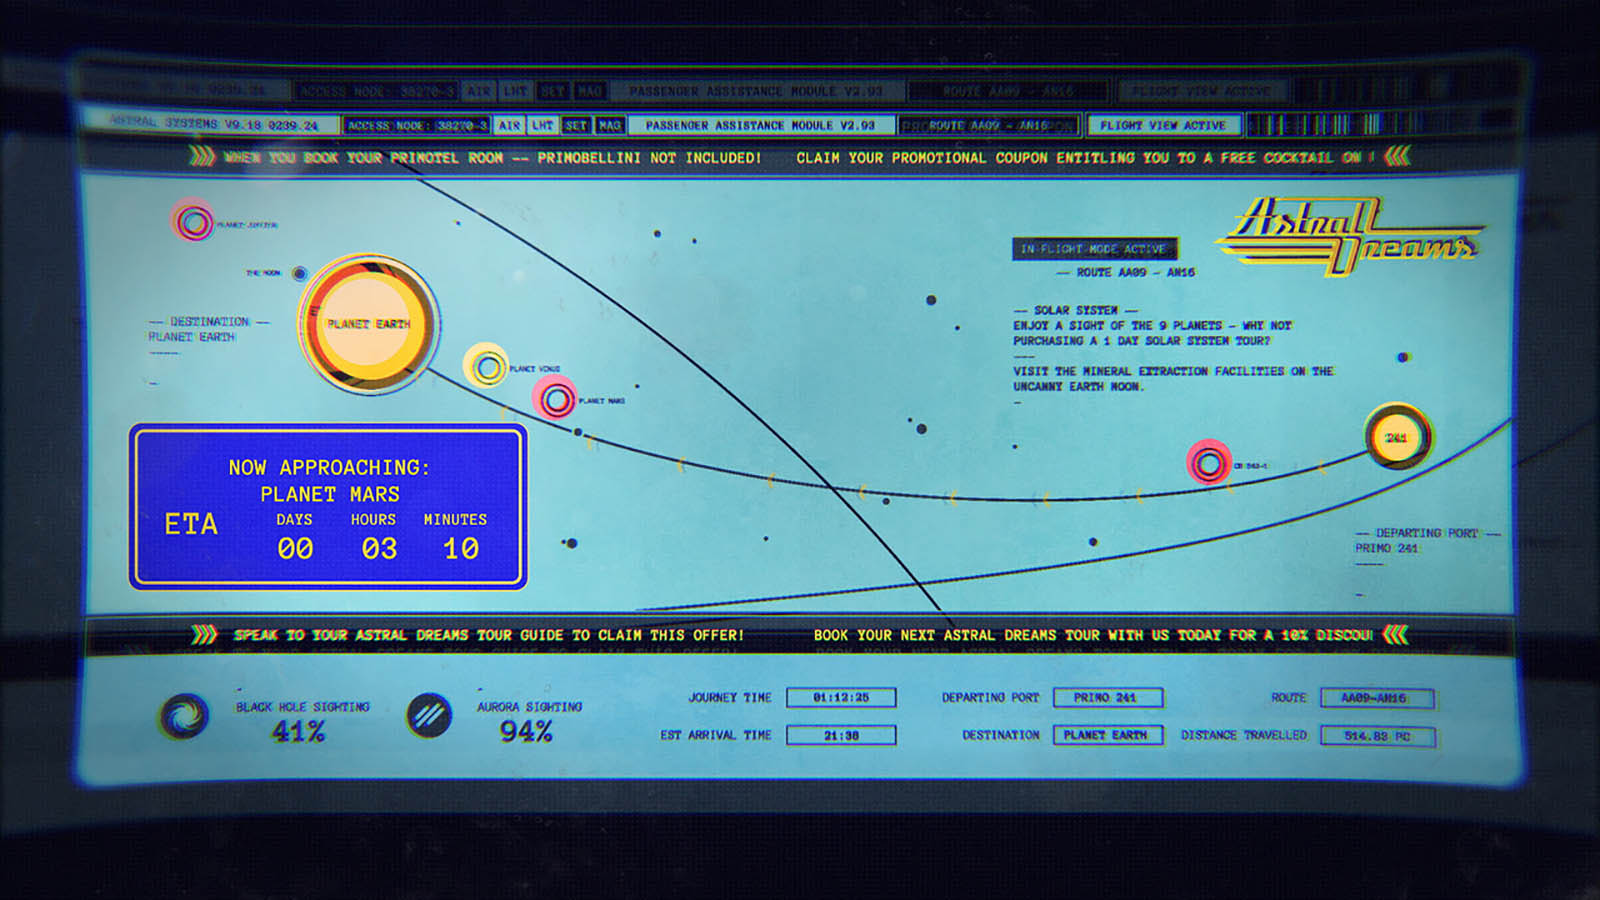 Territory_Studio_ScreenGFX_Electric_Dreams_L_0026.jpg